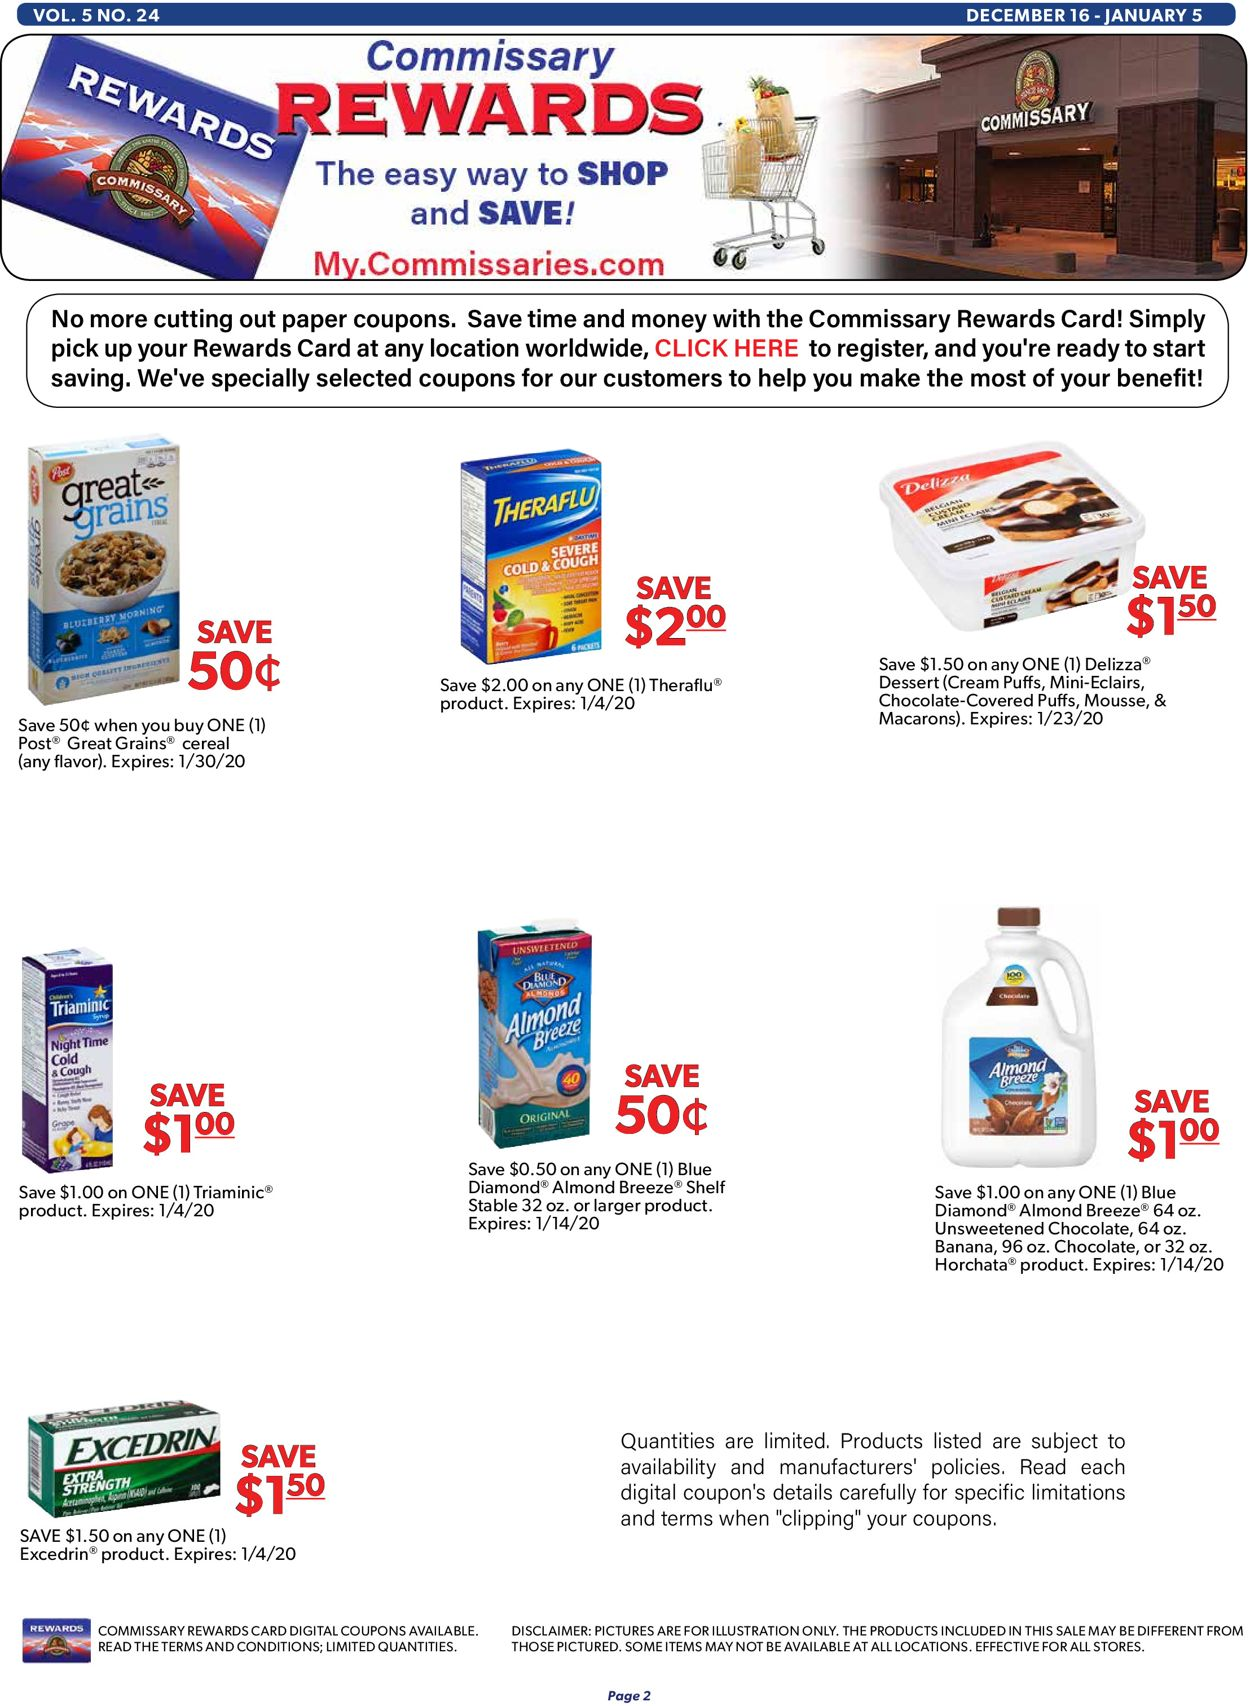 Catalogue Commissary - Holidays Ad 2019 from 12/16/2019